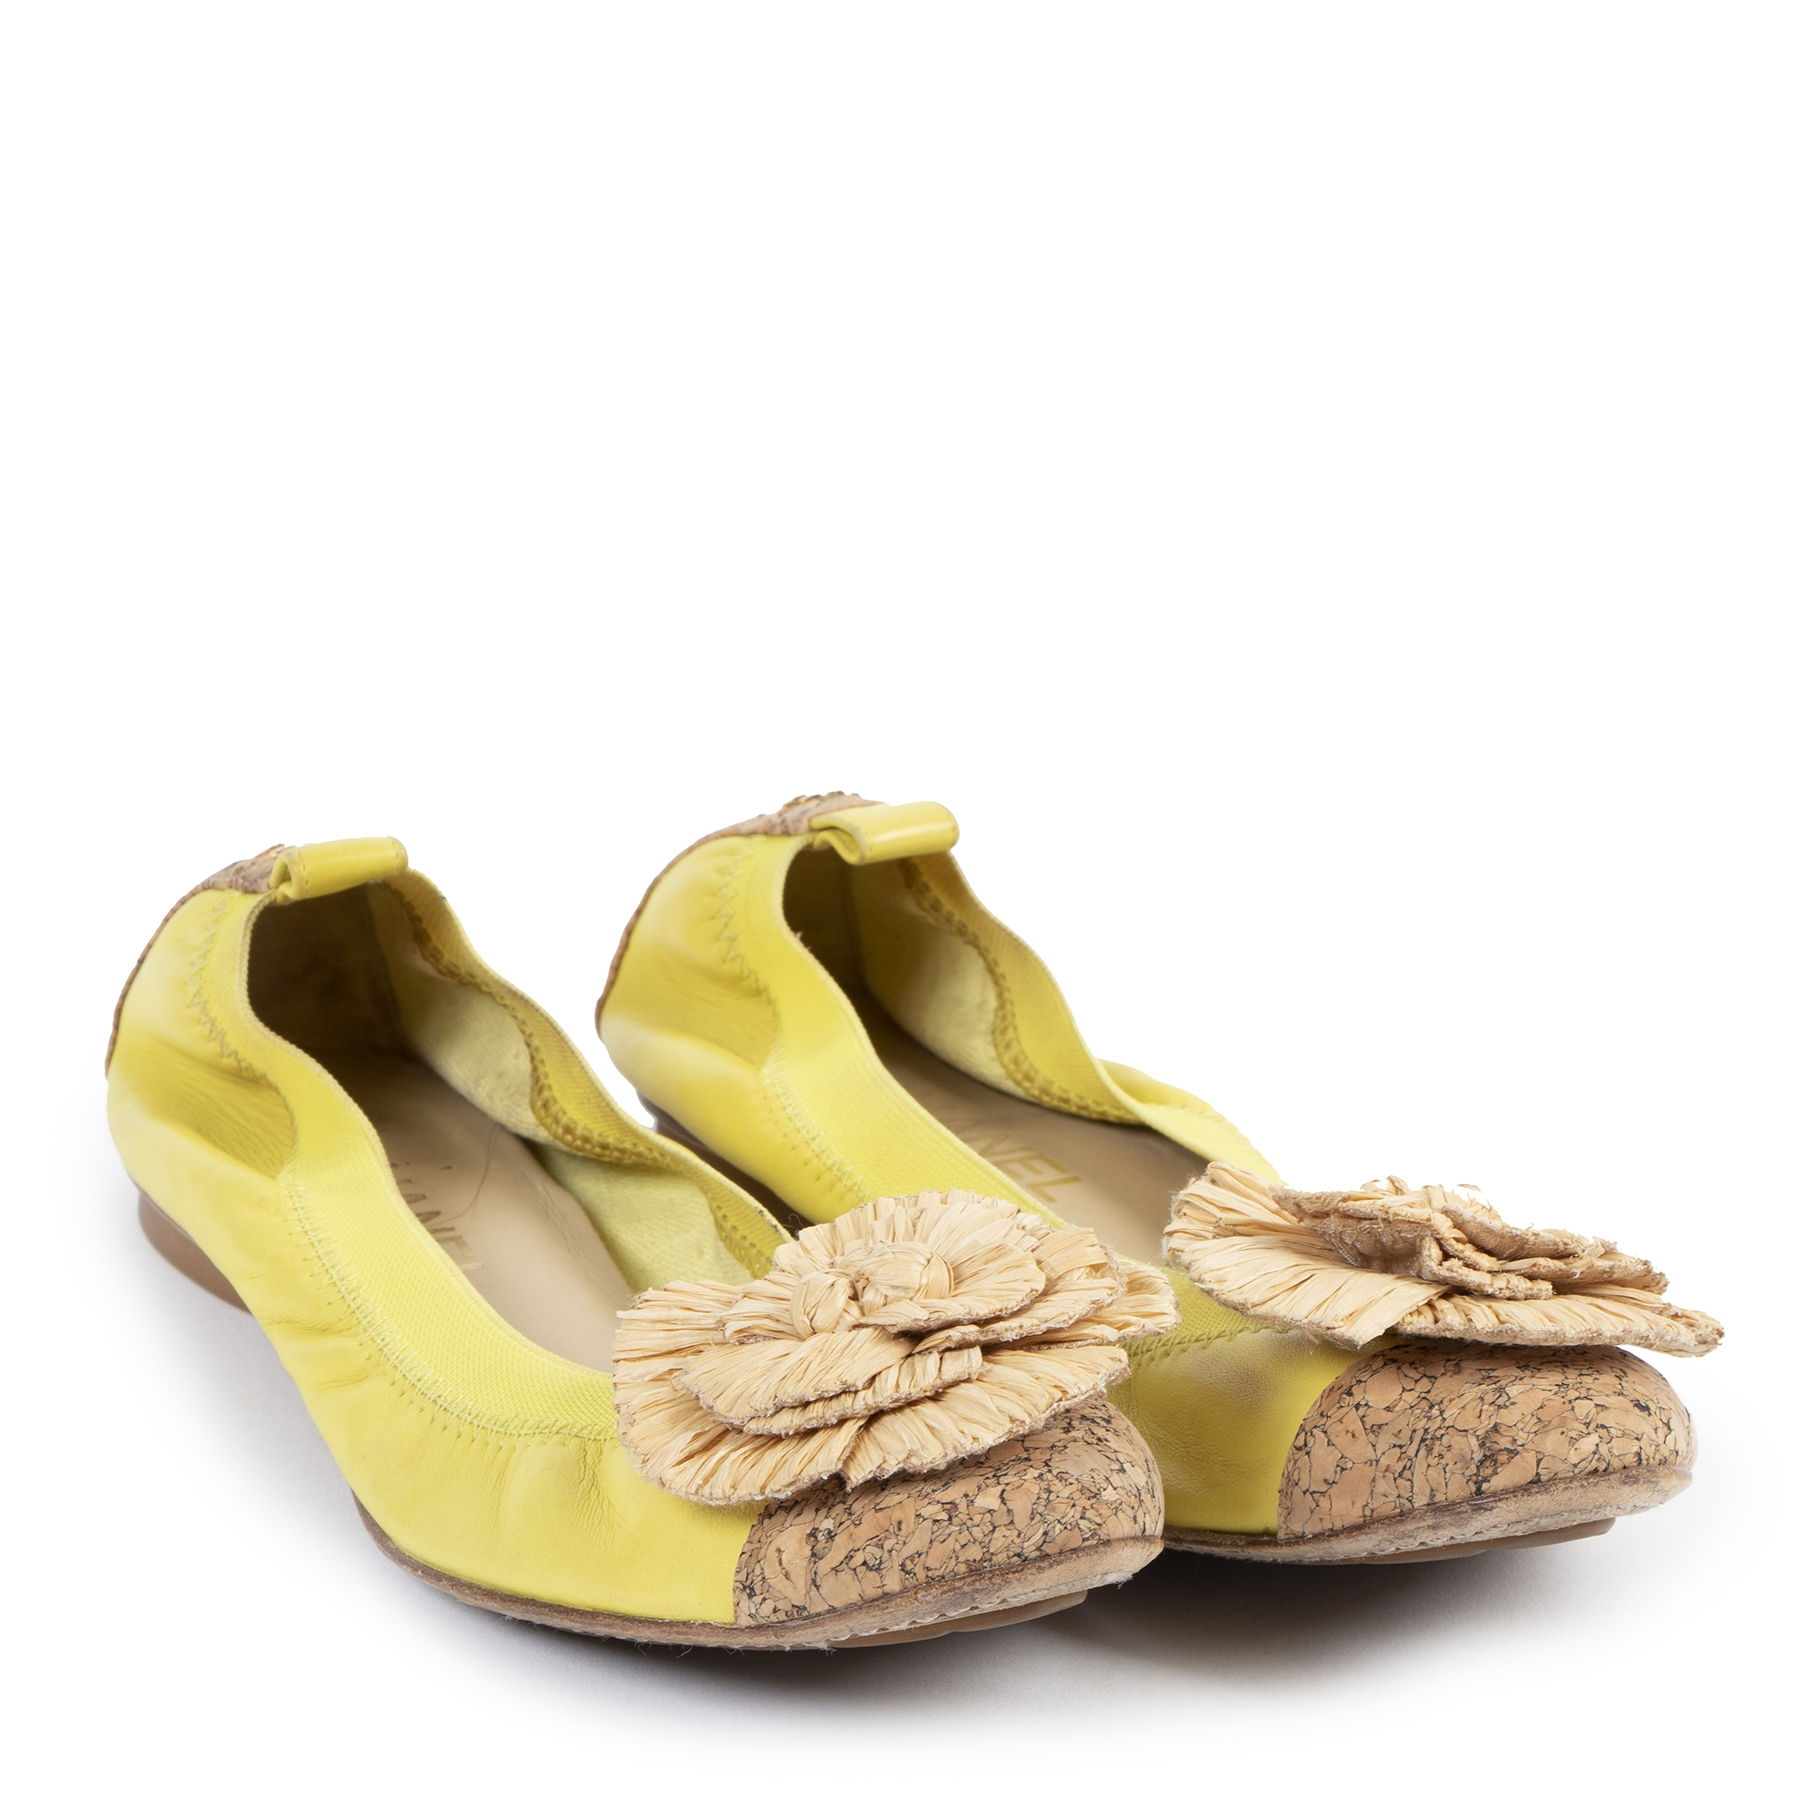 Chanel Yellow Straw Flower Ballerinas - Size 39,5